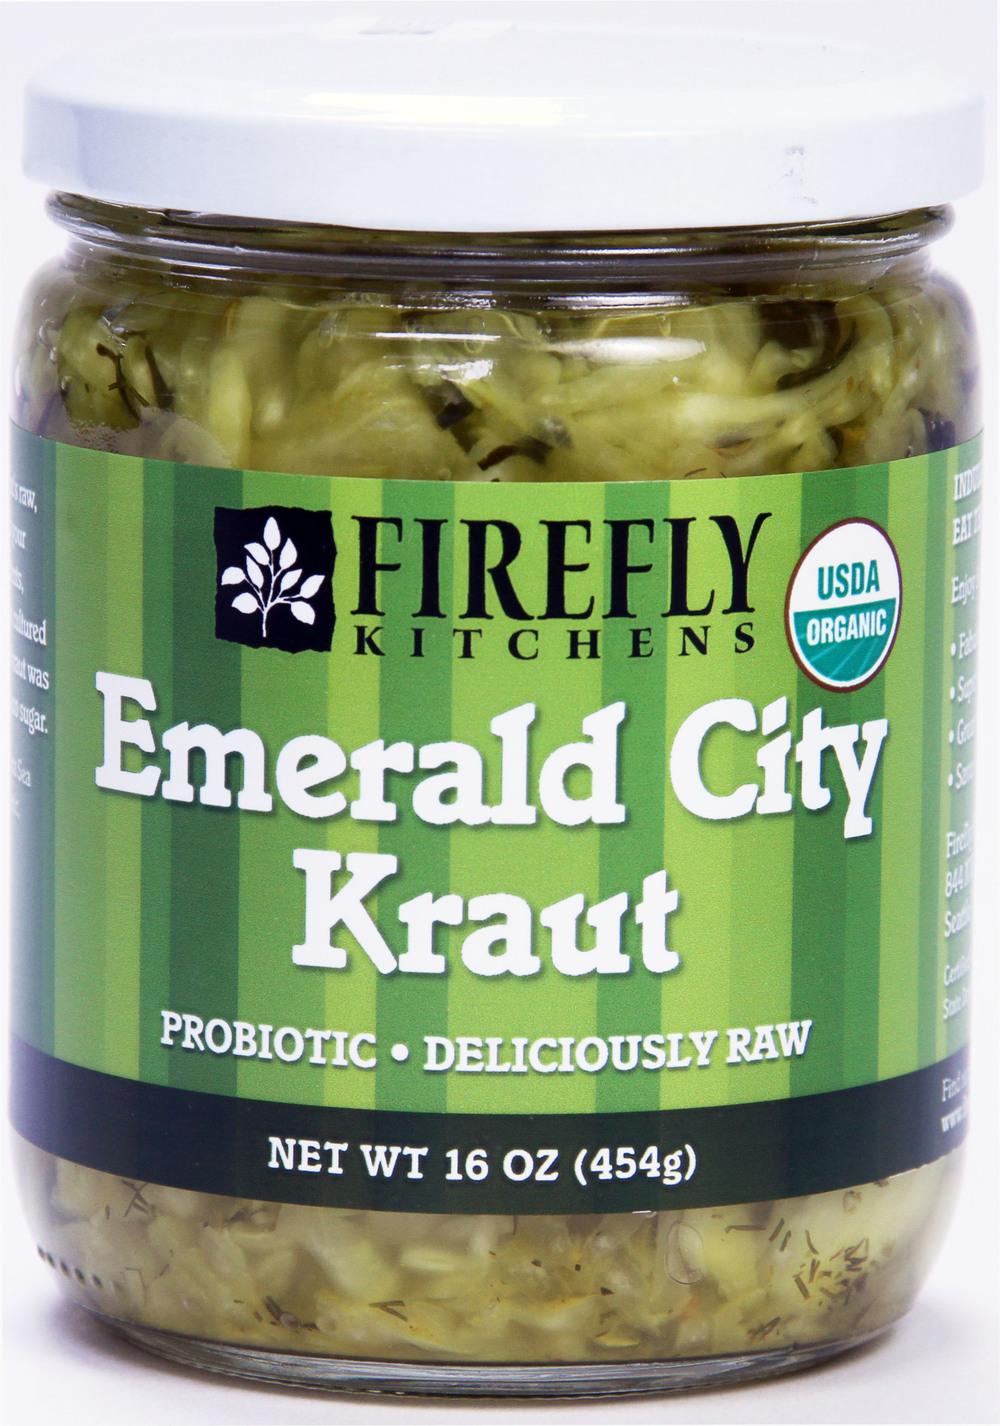 Emerald City Kraut.jpg